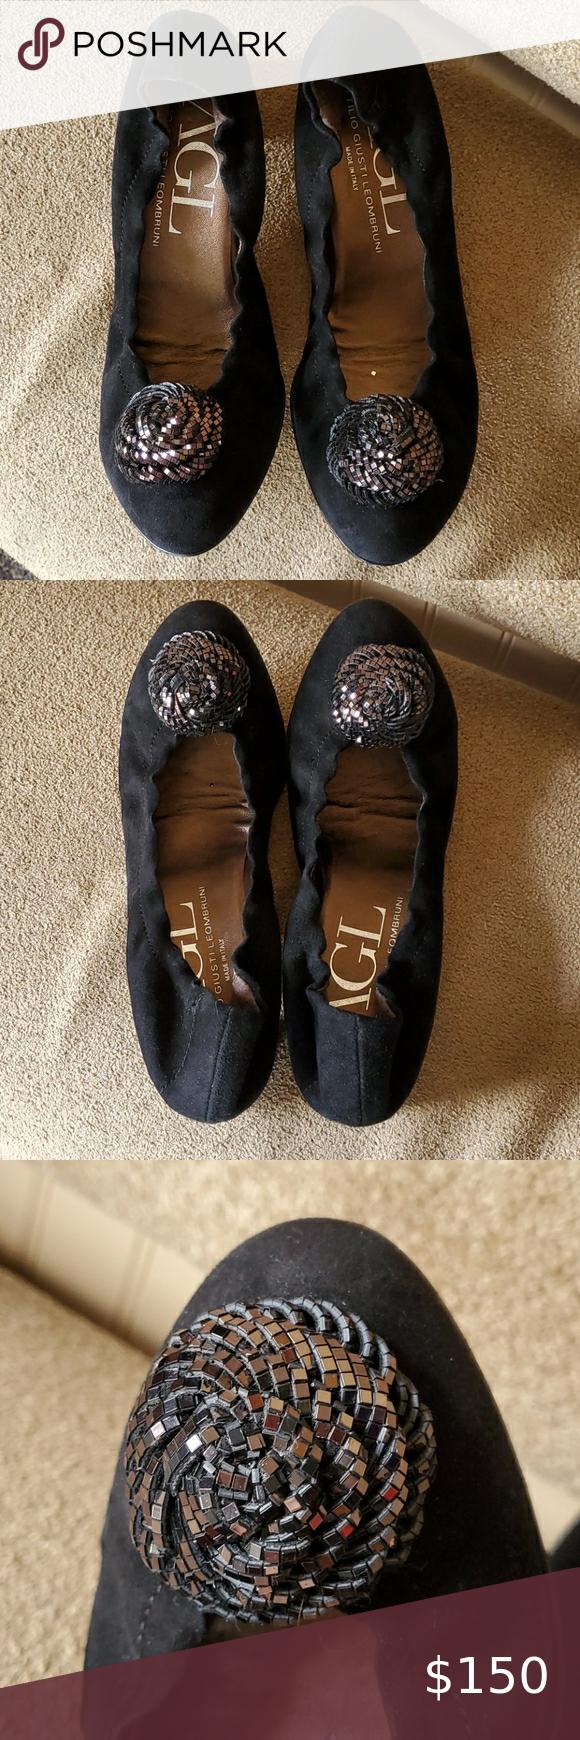 Attilio Giusti Leombruni Shoes | Agl 42 Nude Tan Patent